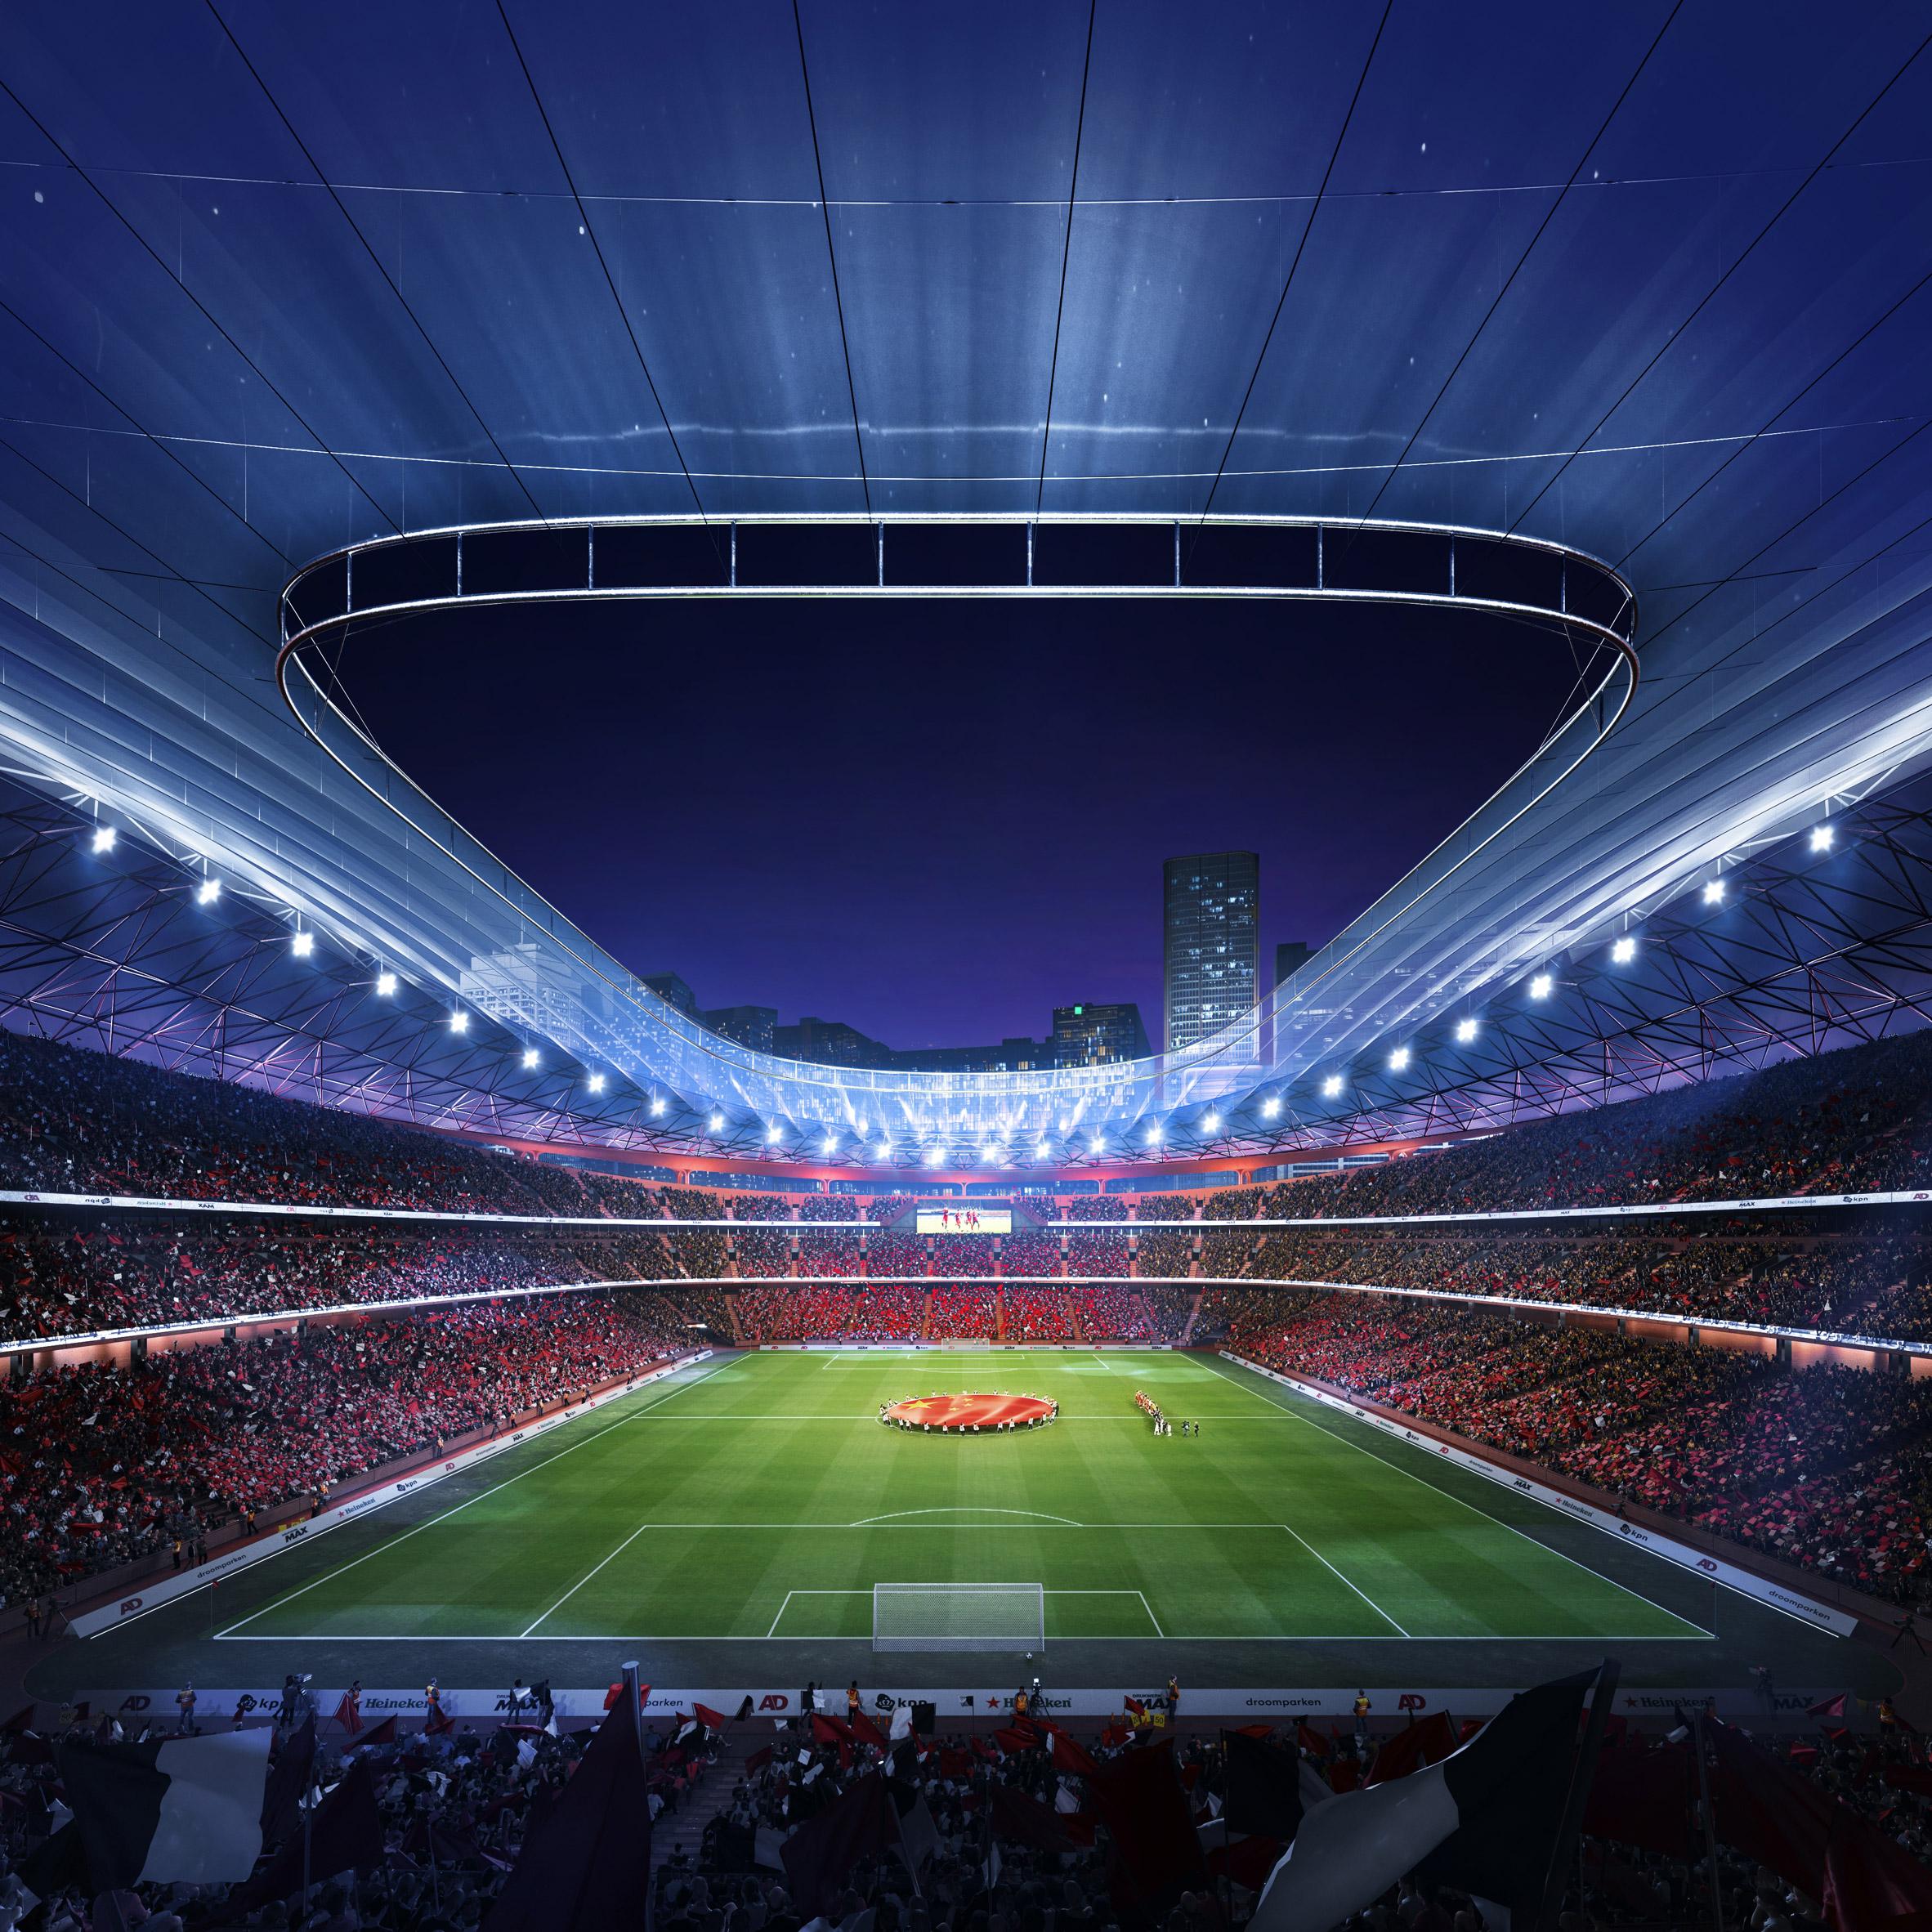 Xi'an International Football Centre stadium proposal by Zaha Hadid Architects in China